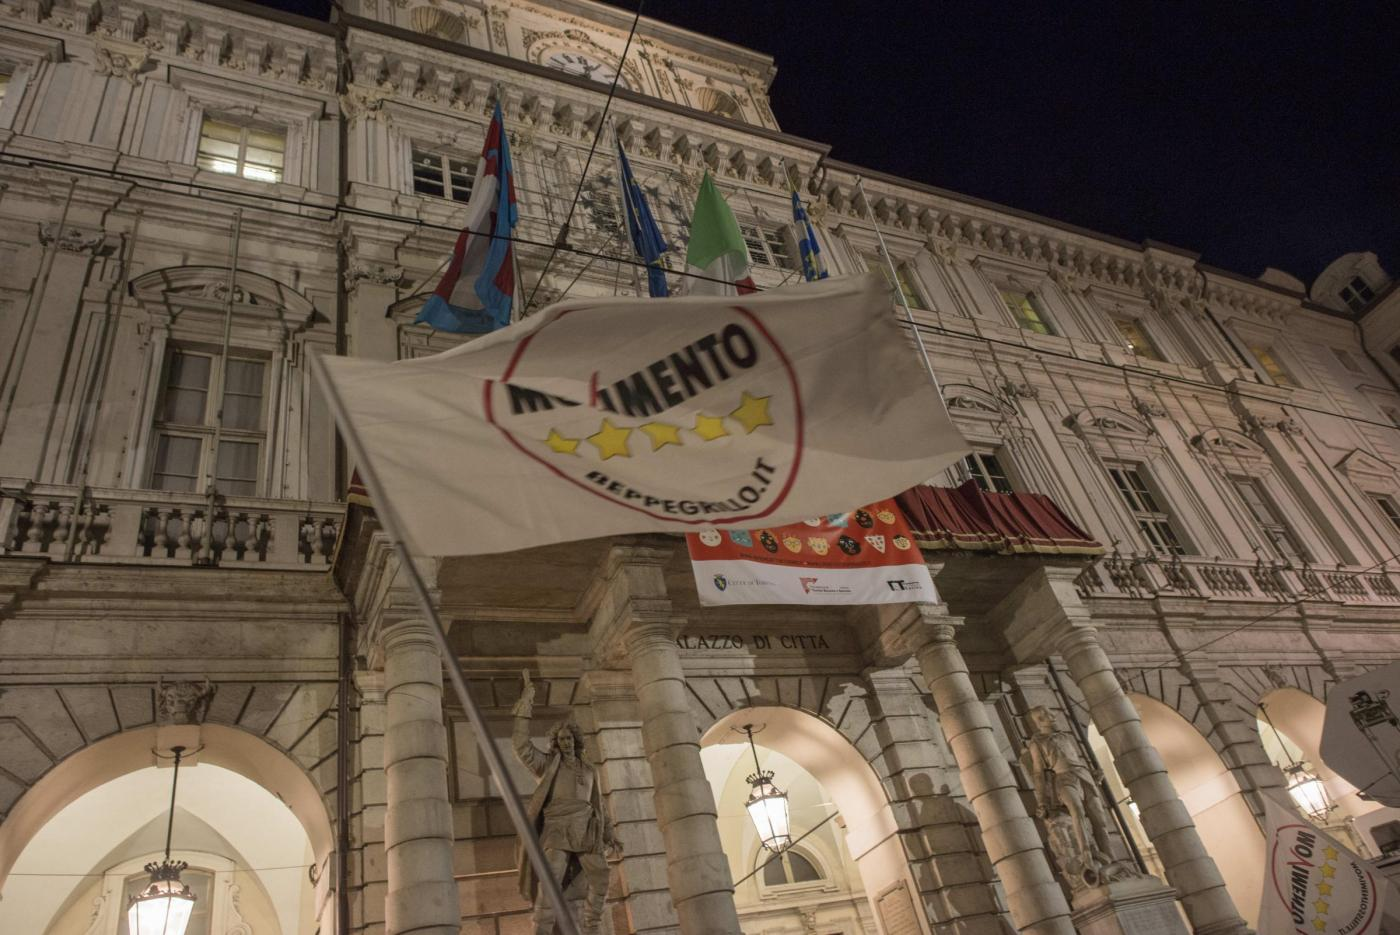 Ballottaggi Torino, Chiara Appendino nuovo sindaco